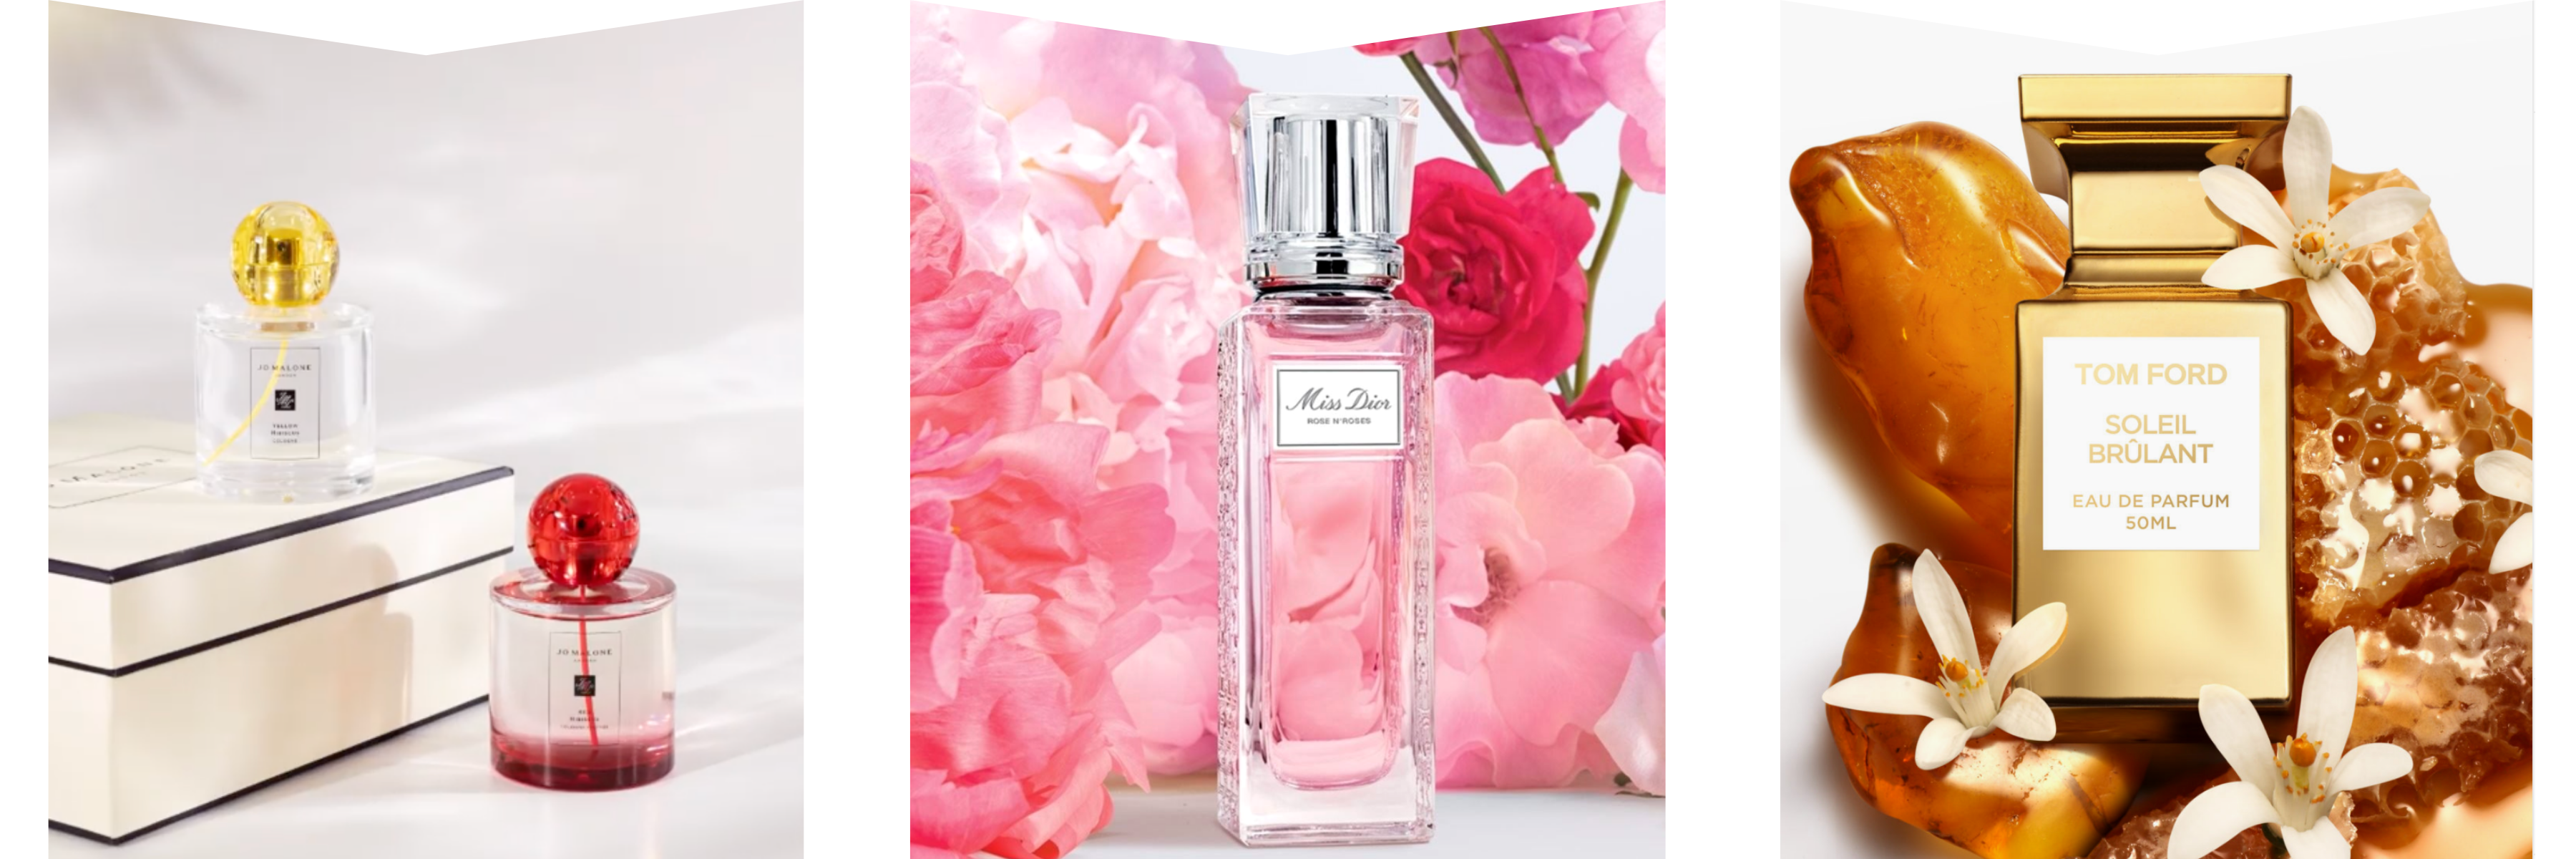 Jo Malone, Dior & Tom Ford perfume